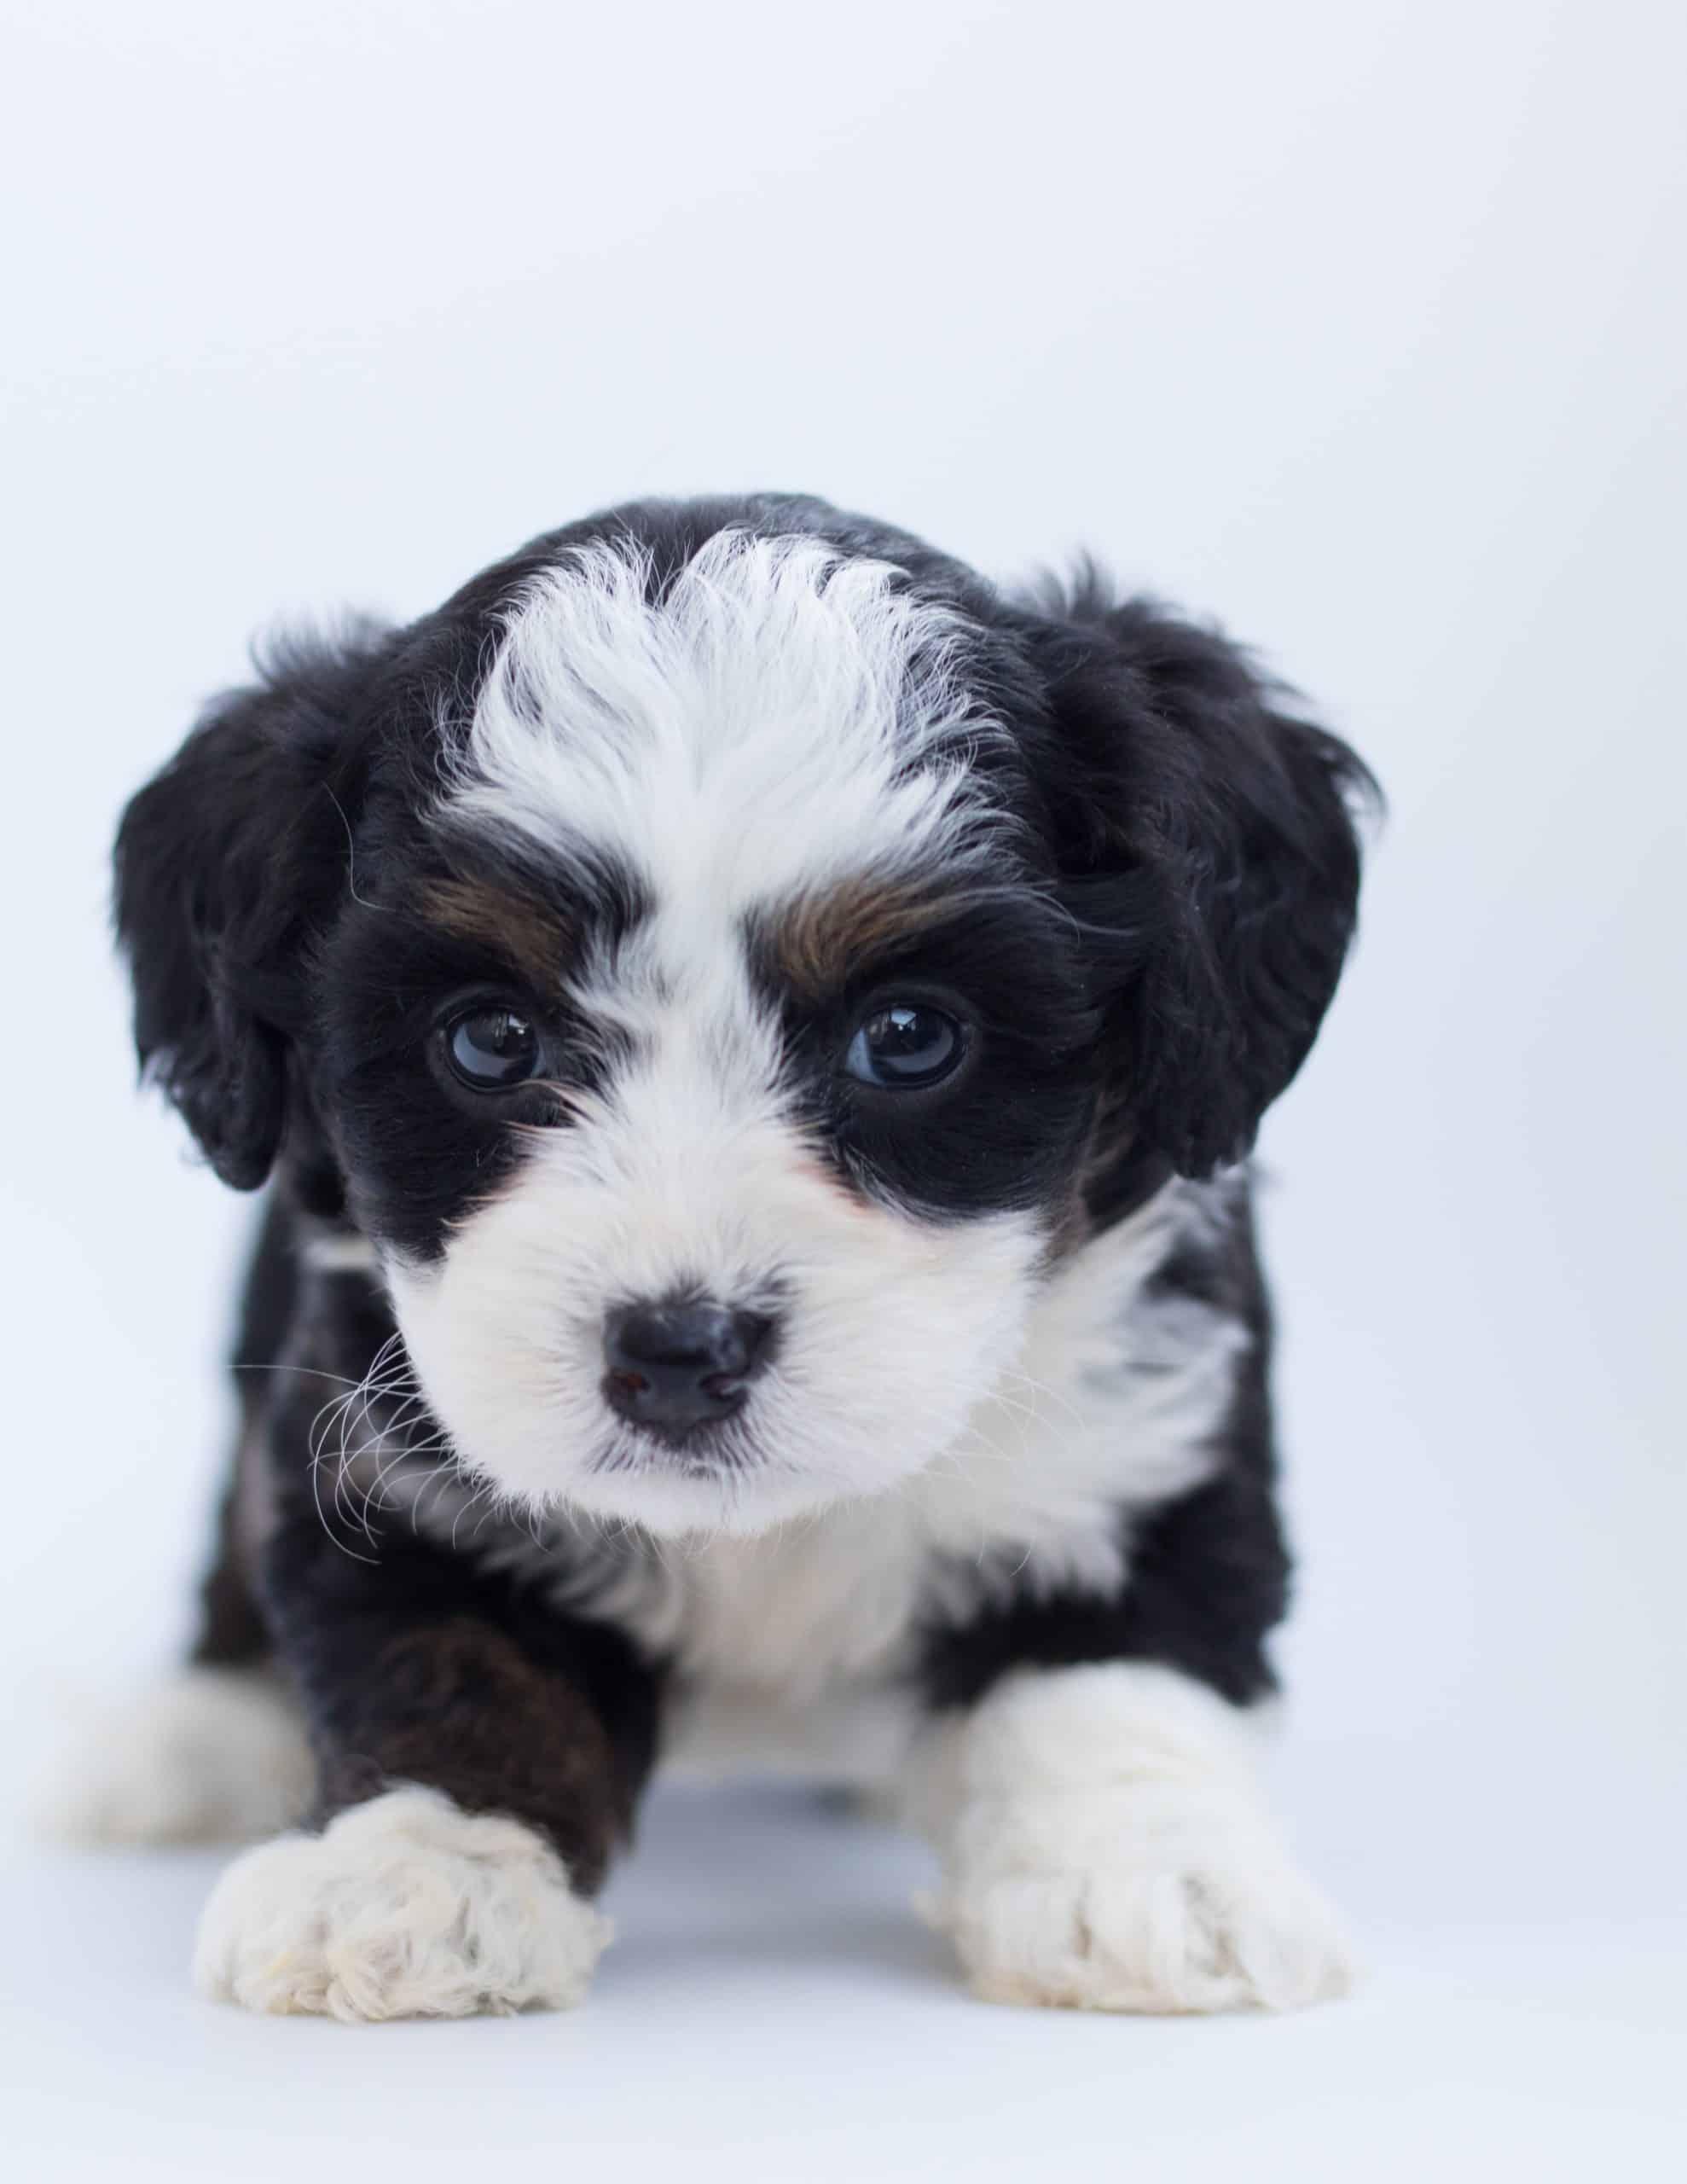 Puppies 101 - The Australian Shepherd Puppy Trains